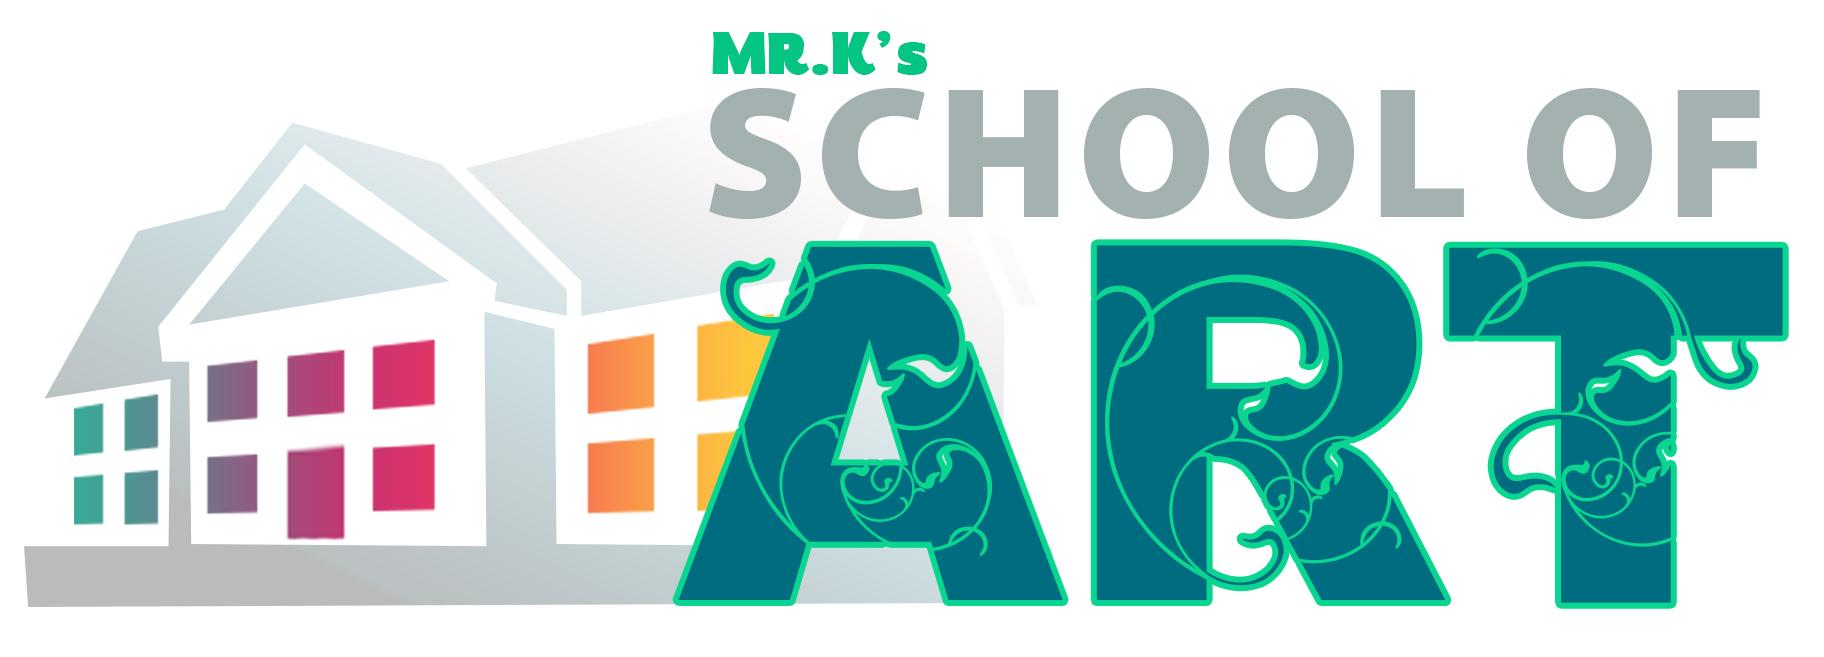 mr.k's school of art - art classes